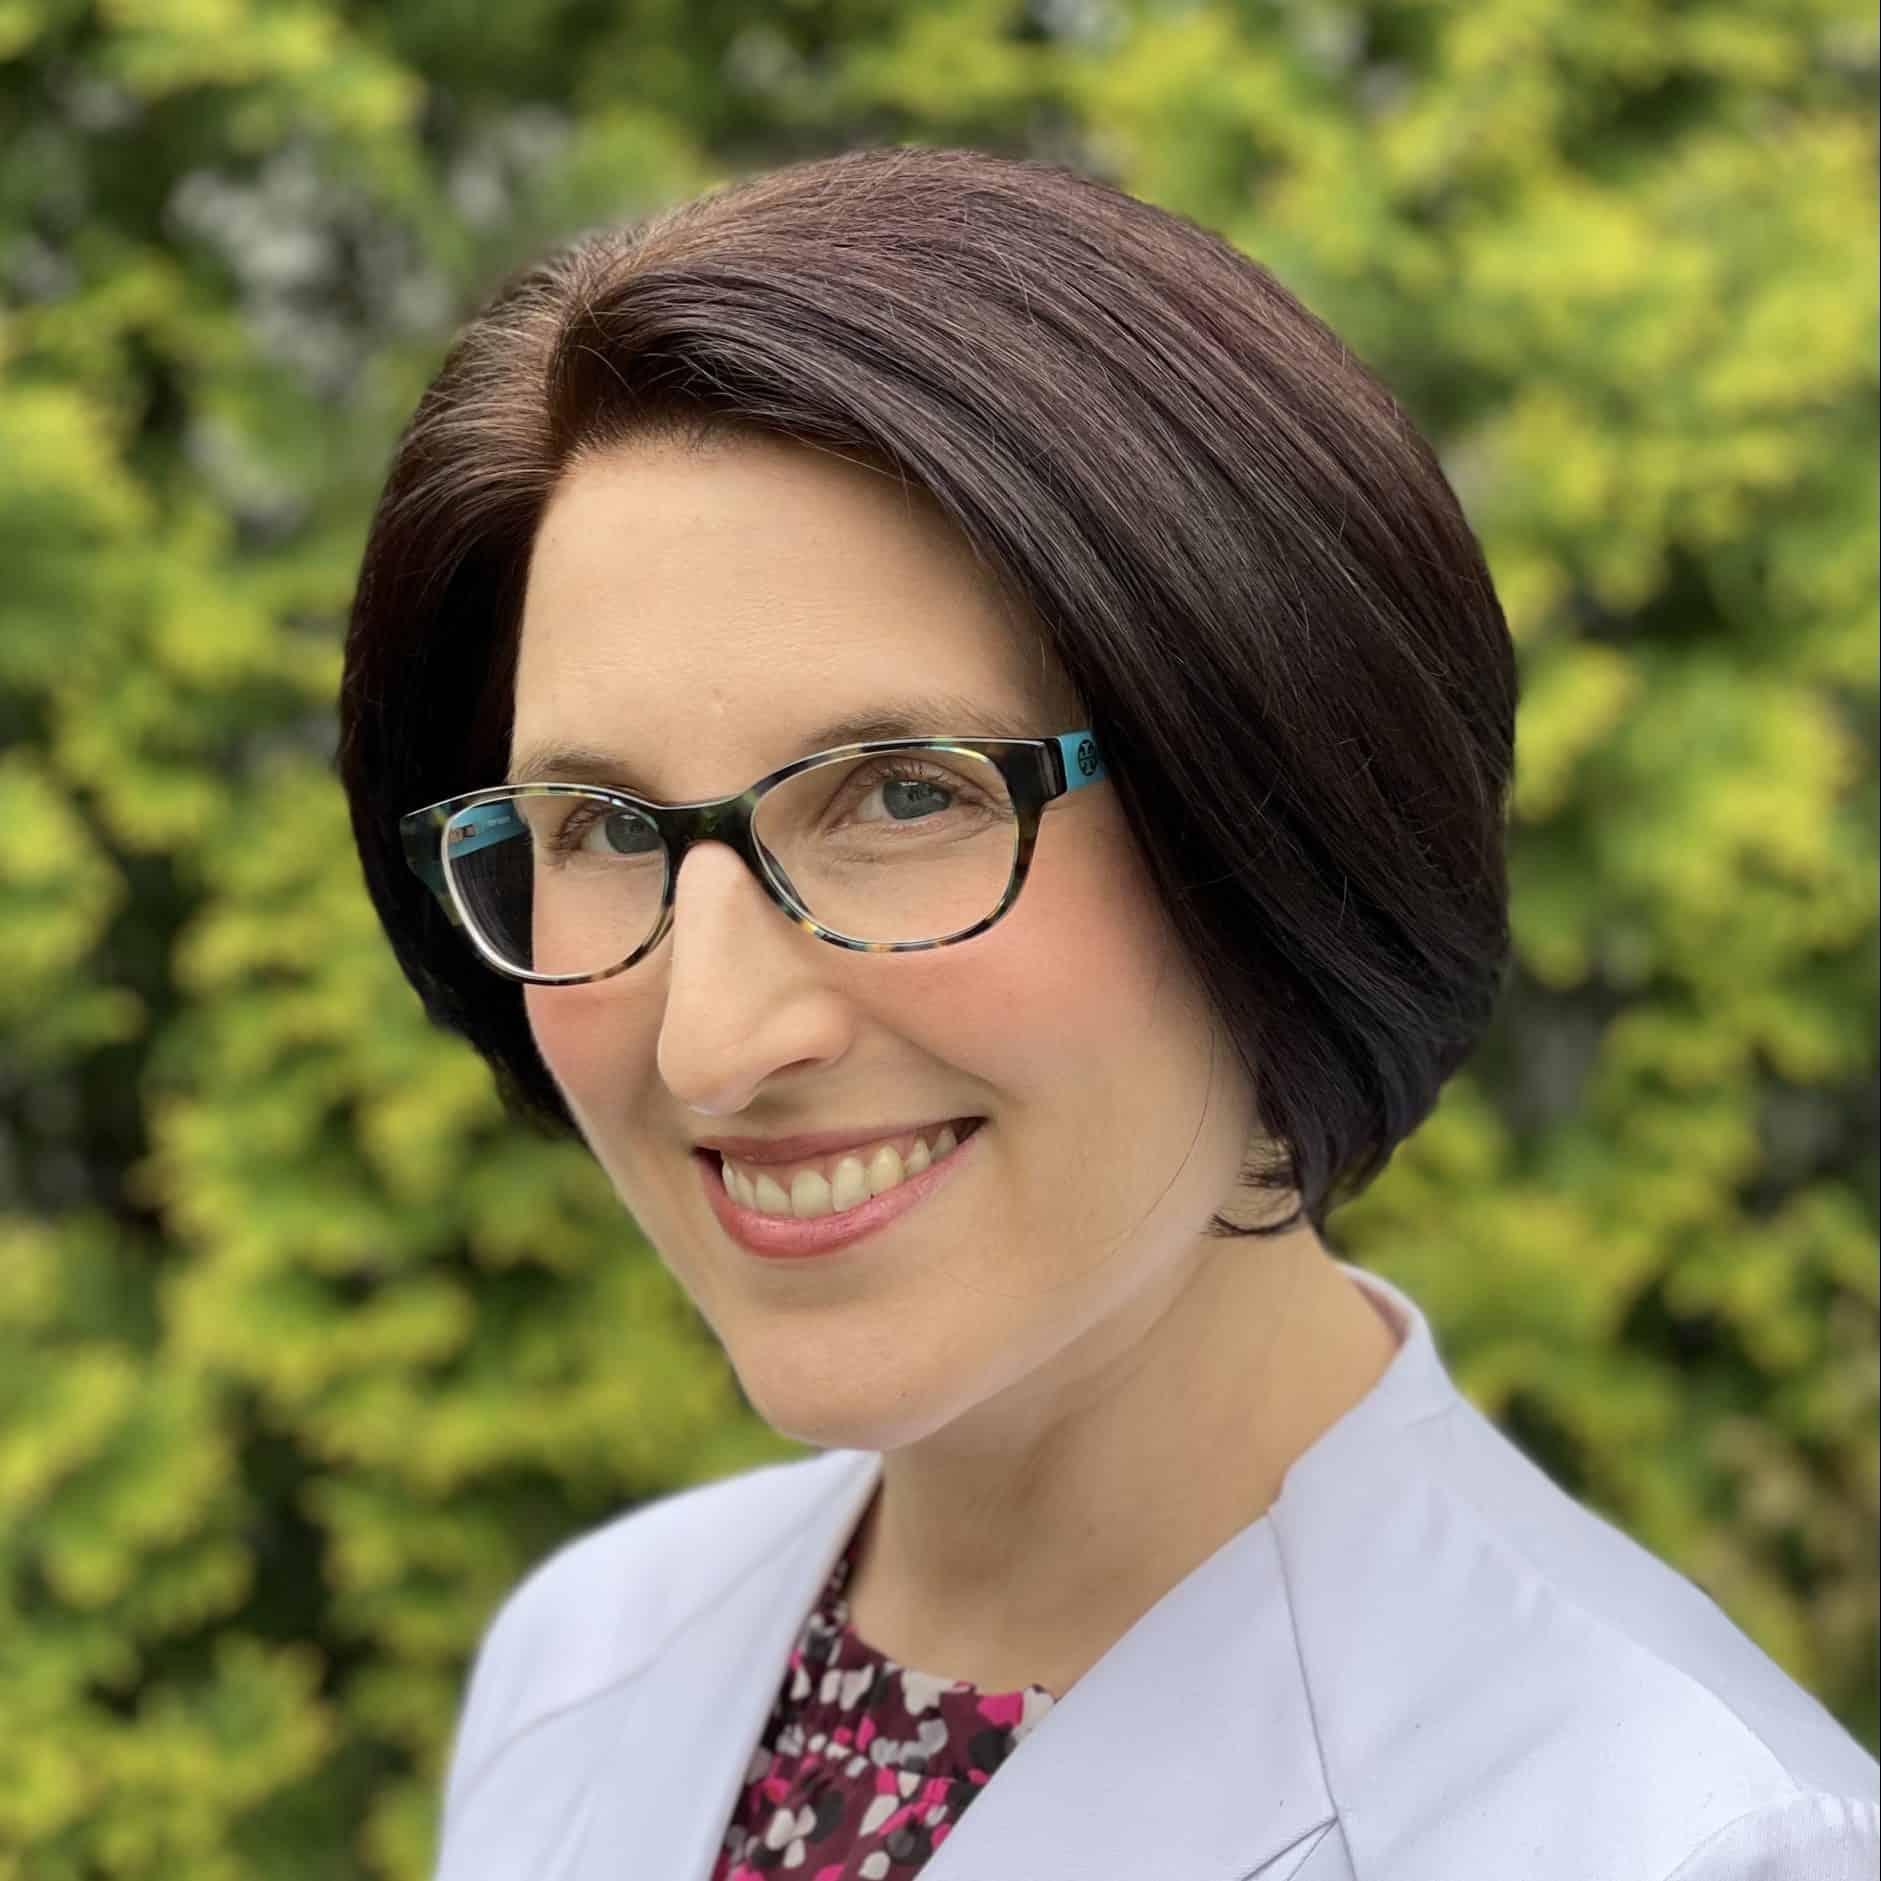 AUDREY LANCE, MD, MS